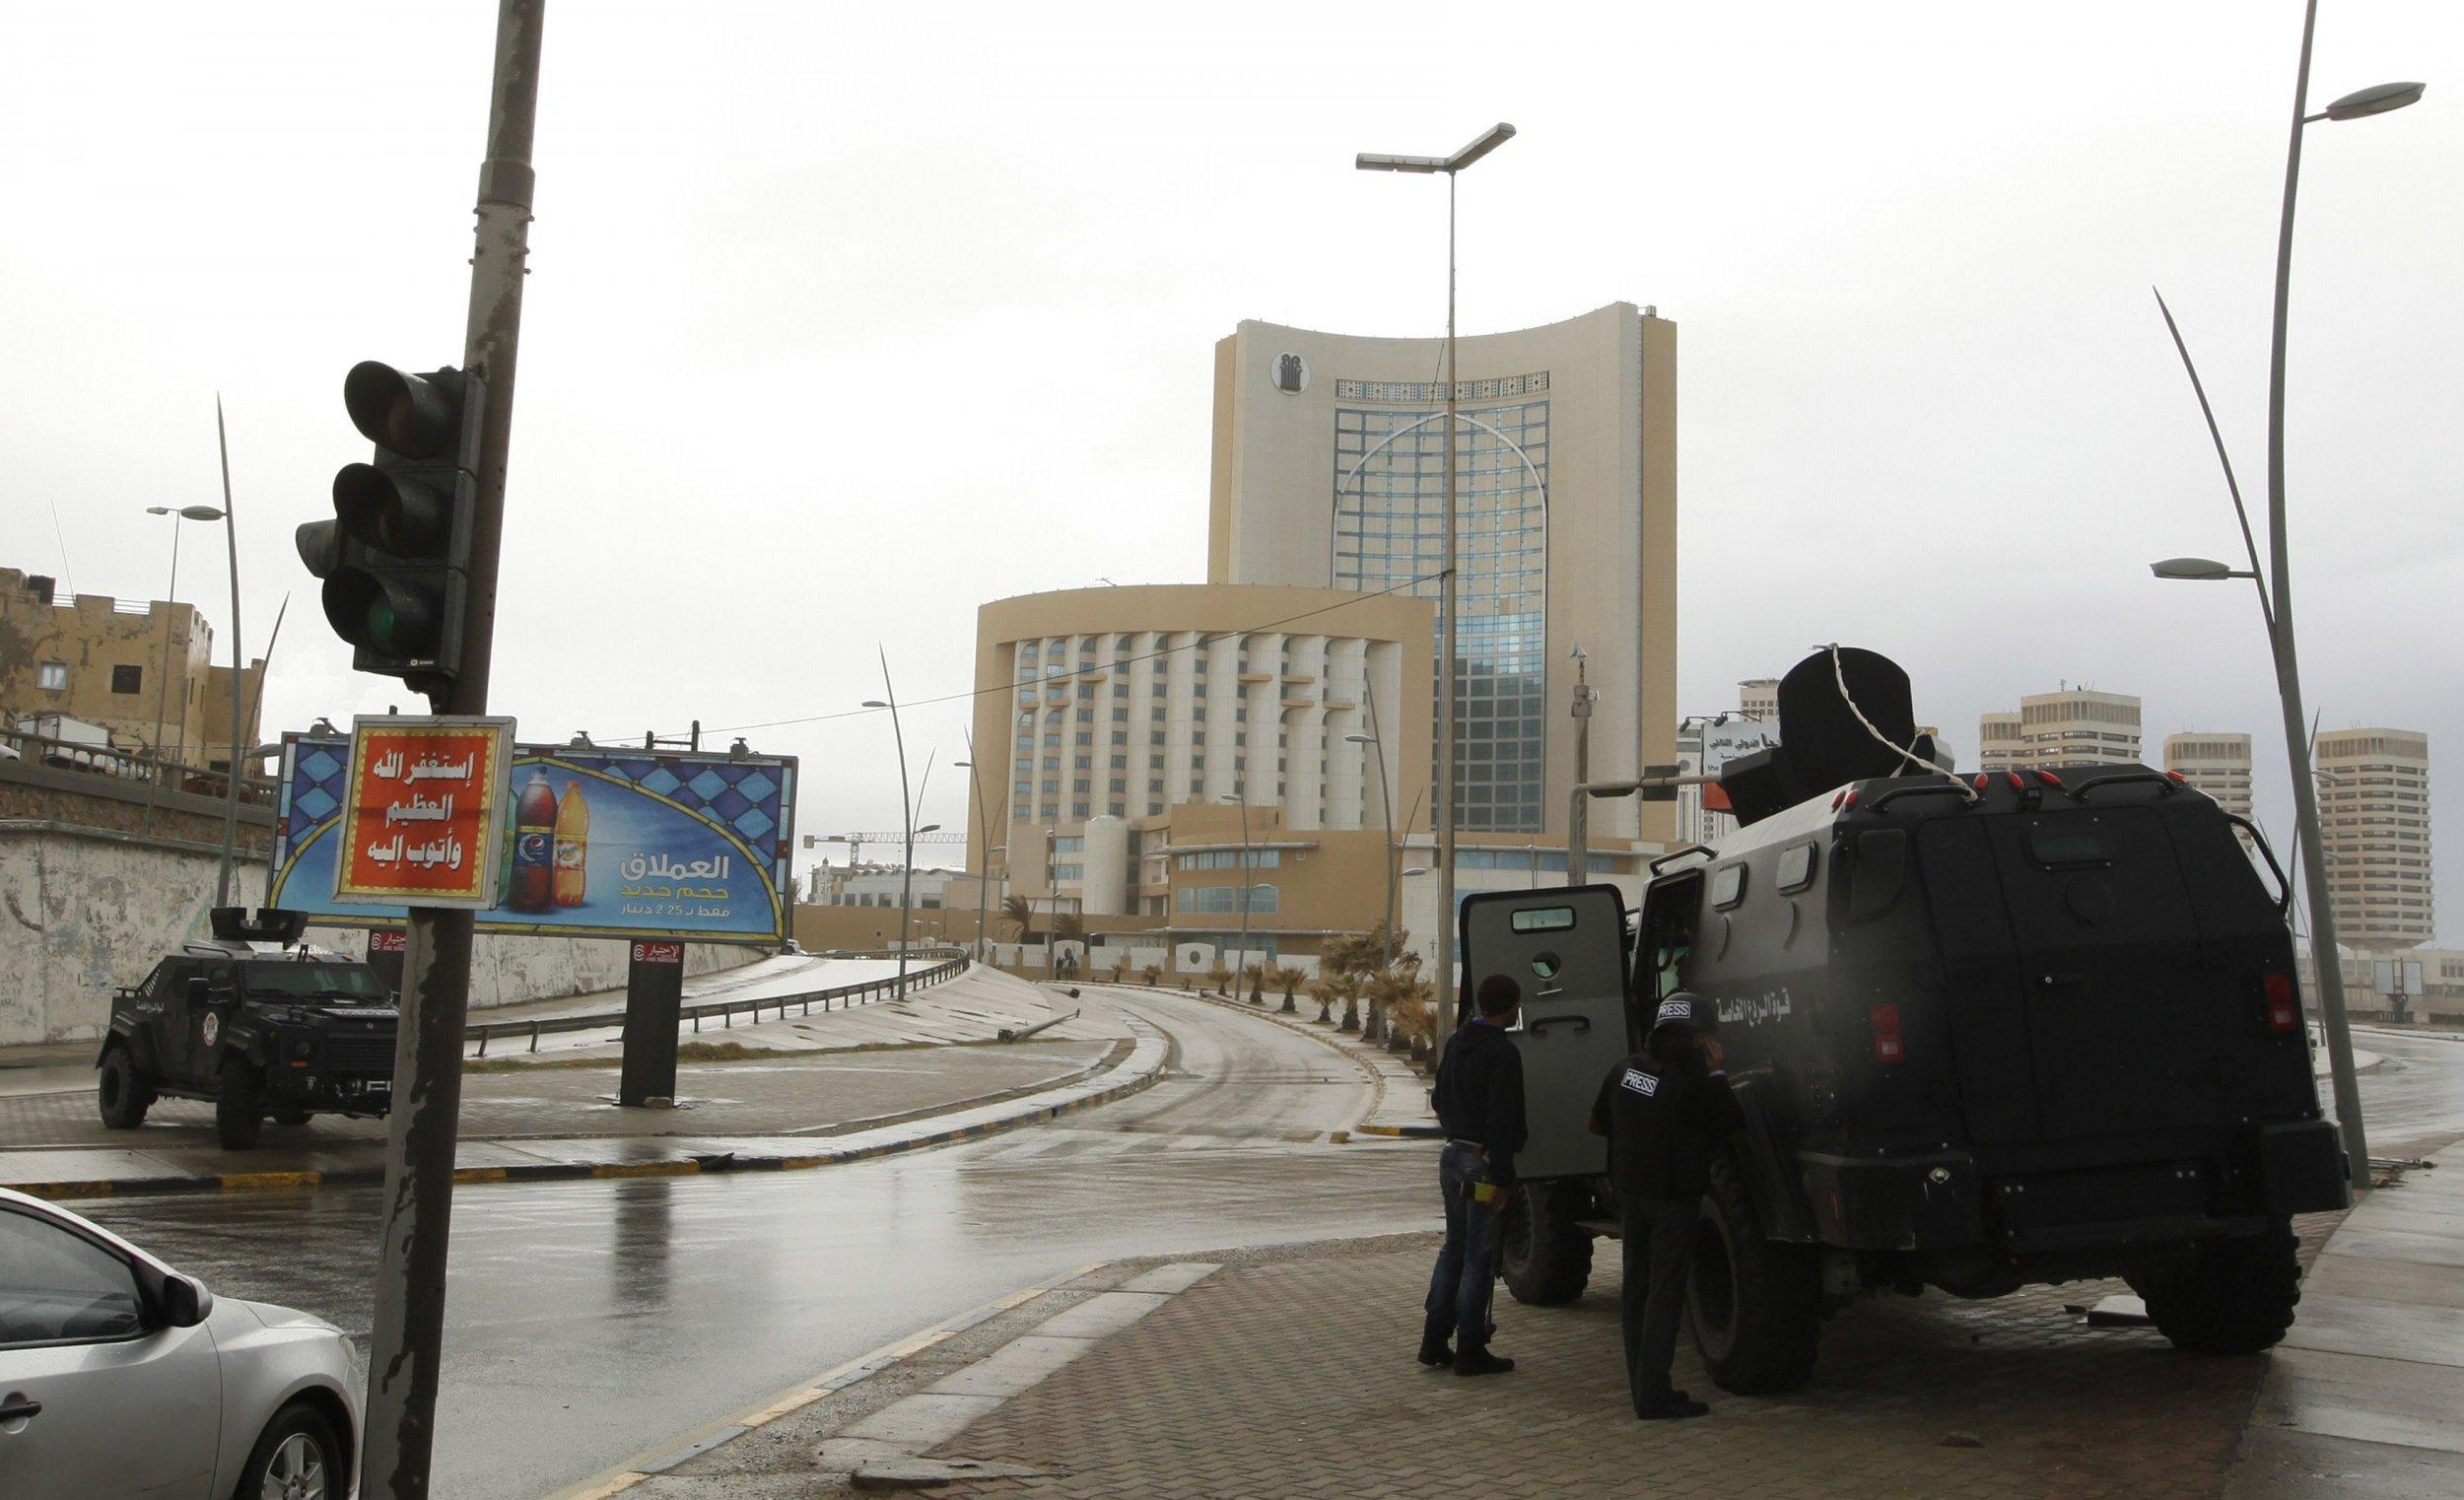 2015-01-27T125213Z_790742458_GM1EB1R1LUV01_RTRMADP_3_LIBYA-SECURITY